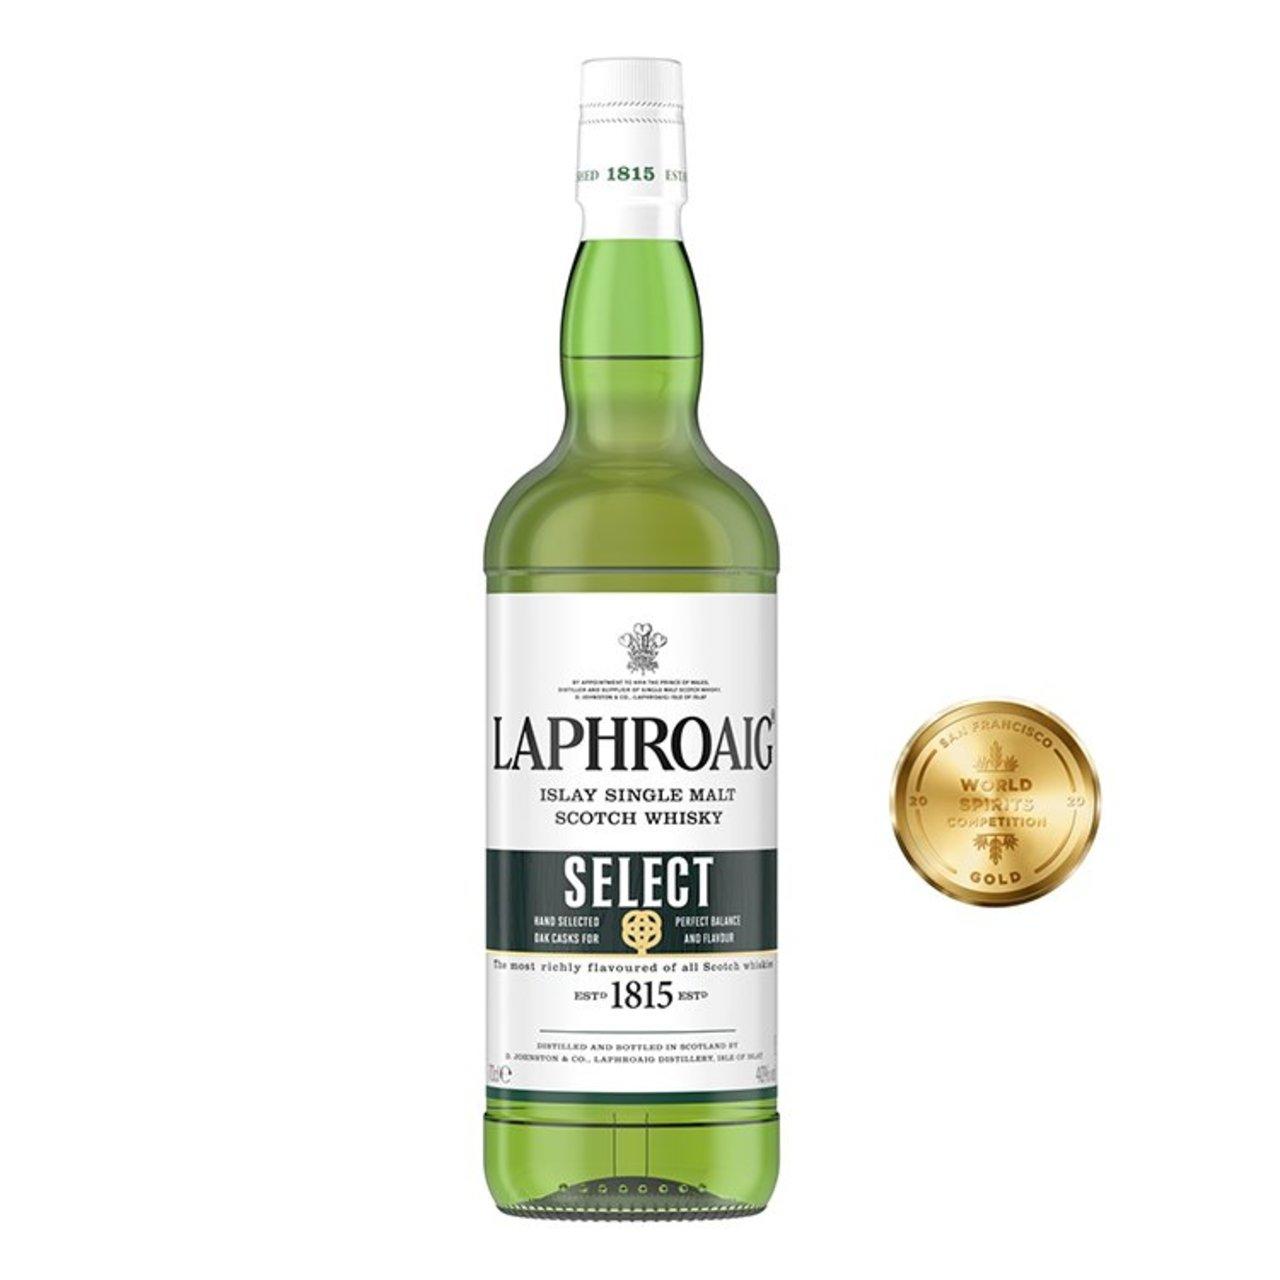 Laphroaig Islay Select Single Malt Whisky 70cl (40%) - £22 at Morrisons